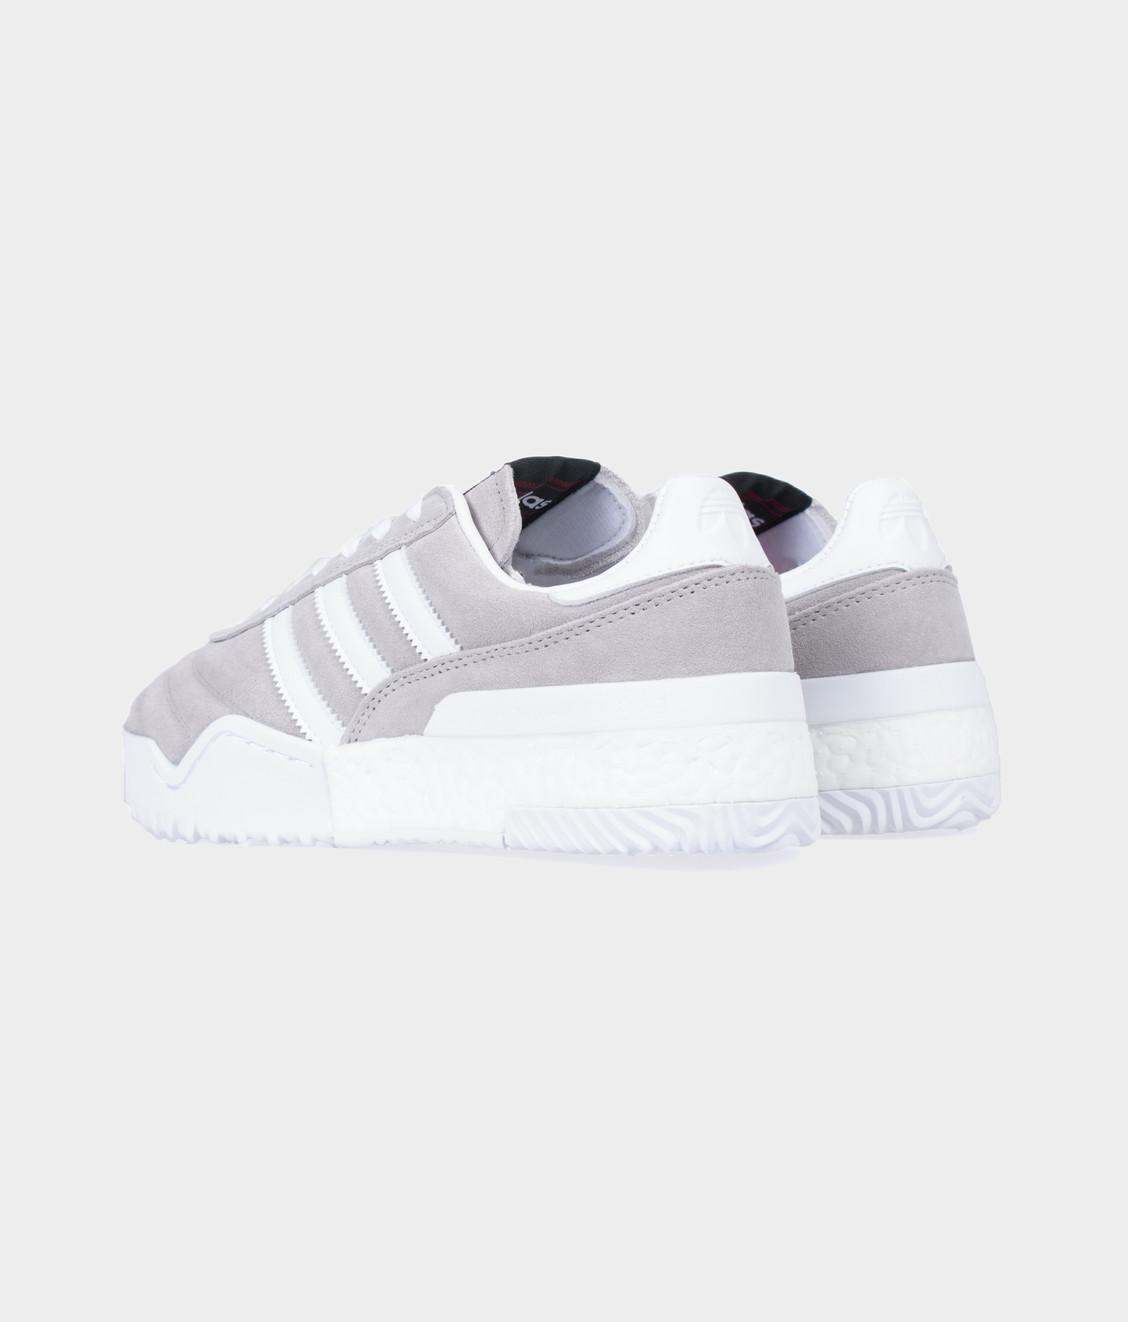 Adidas Adidas Alexander Wang Bball Soccer Clear Granite White